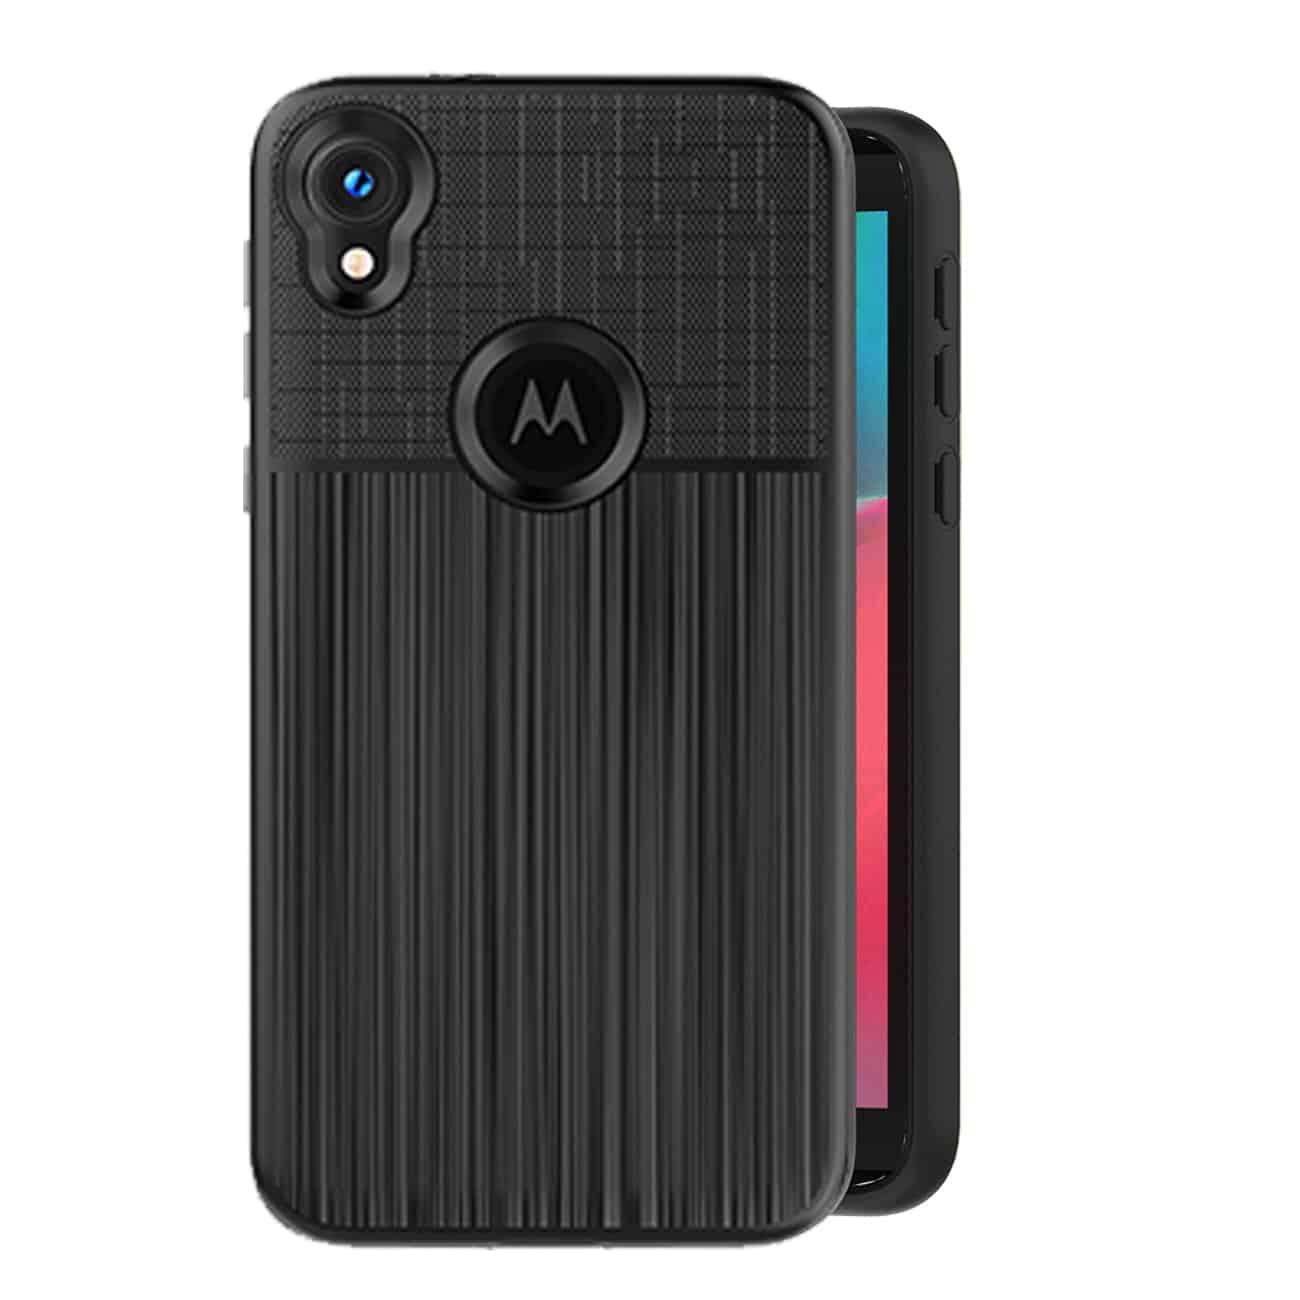 ISTIK MOTOROLA E6 Lightweight Case In Black